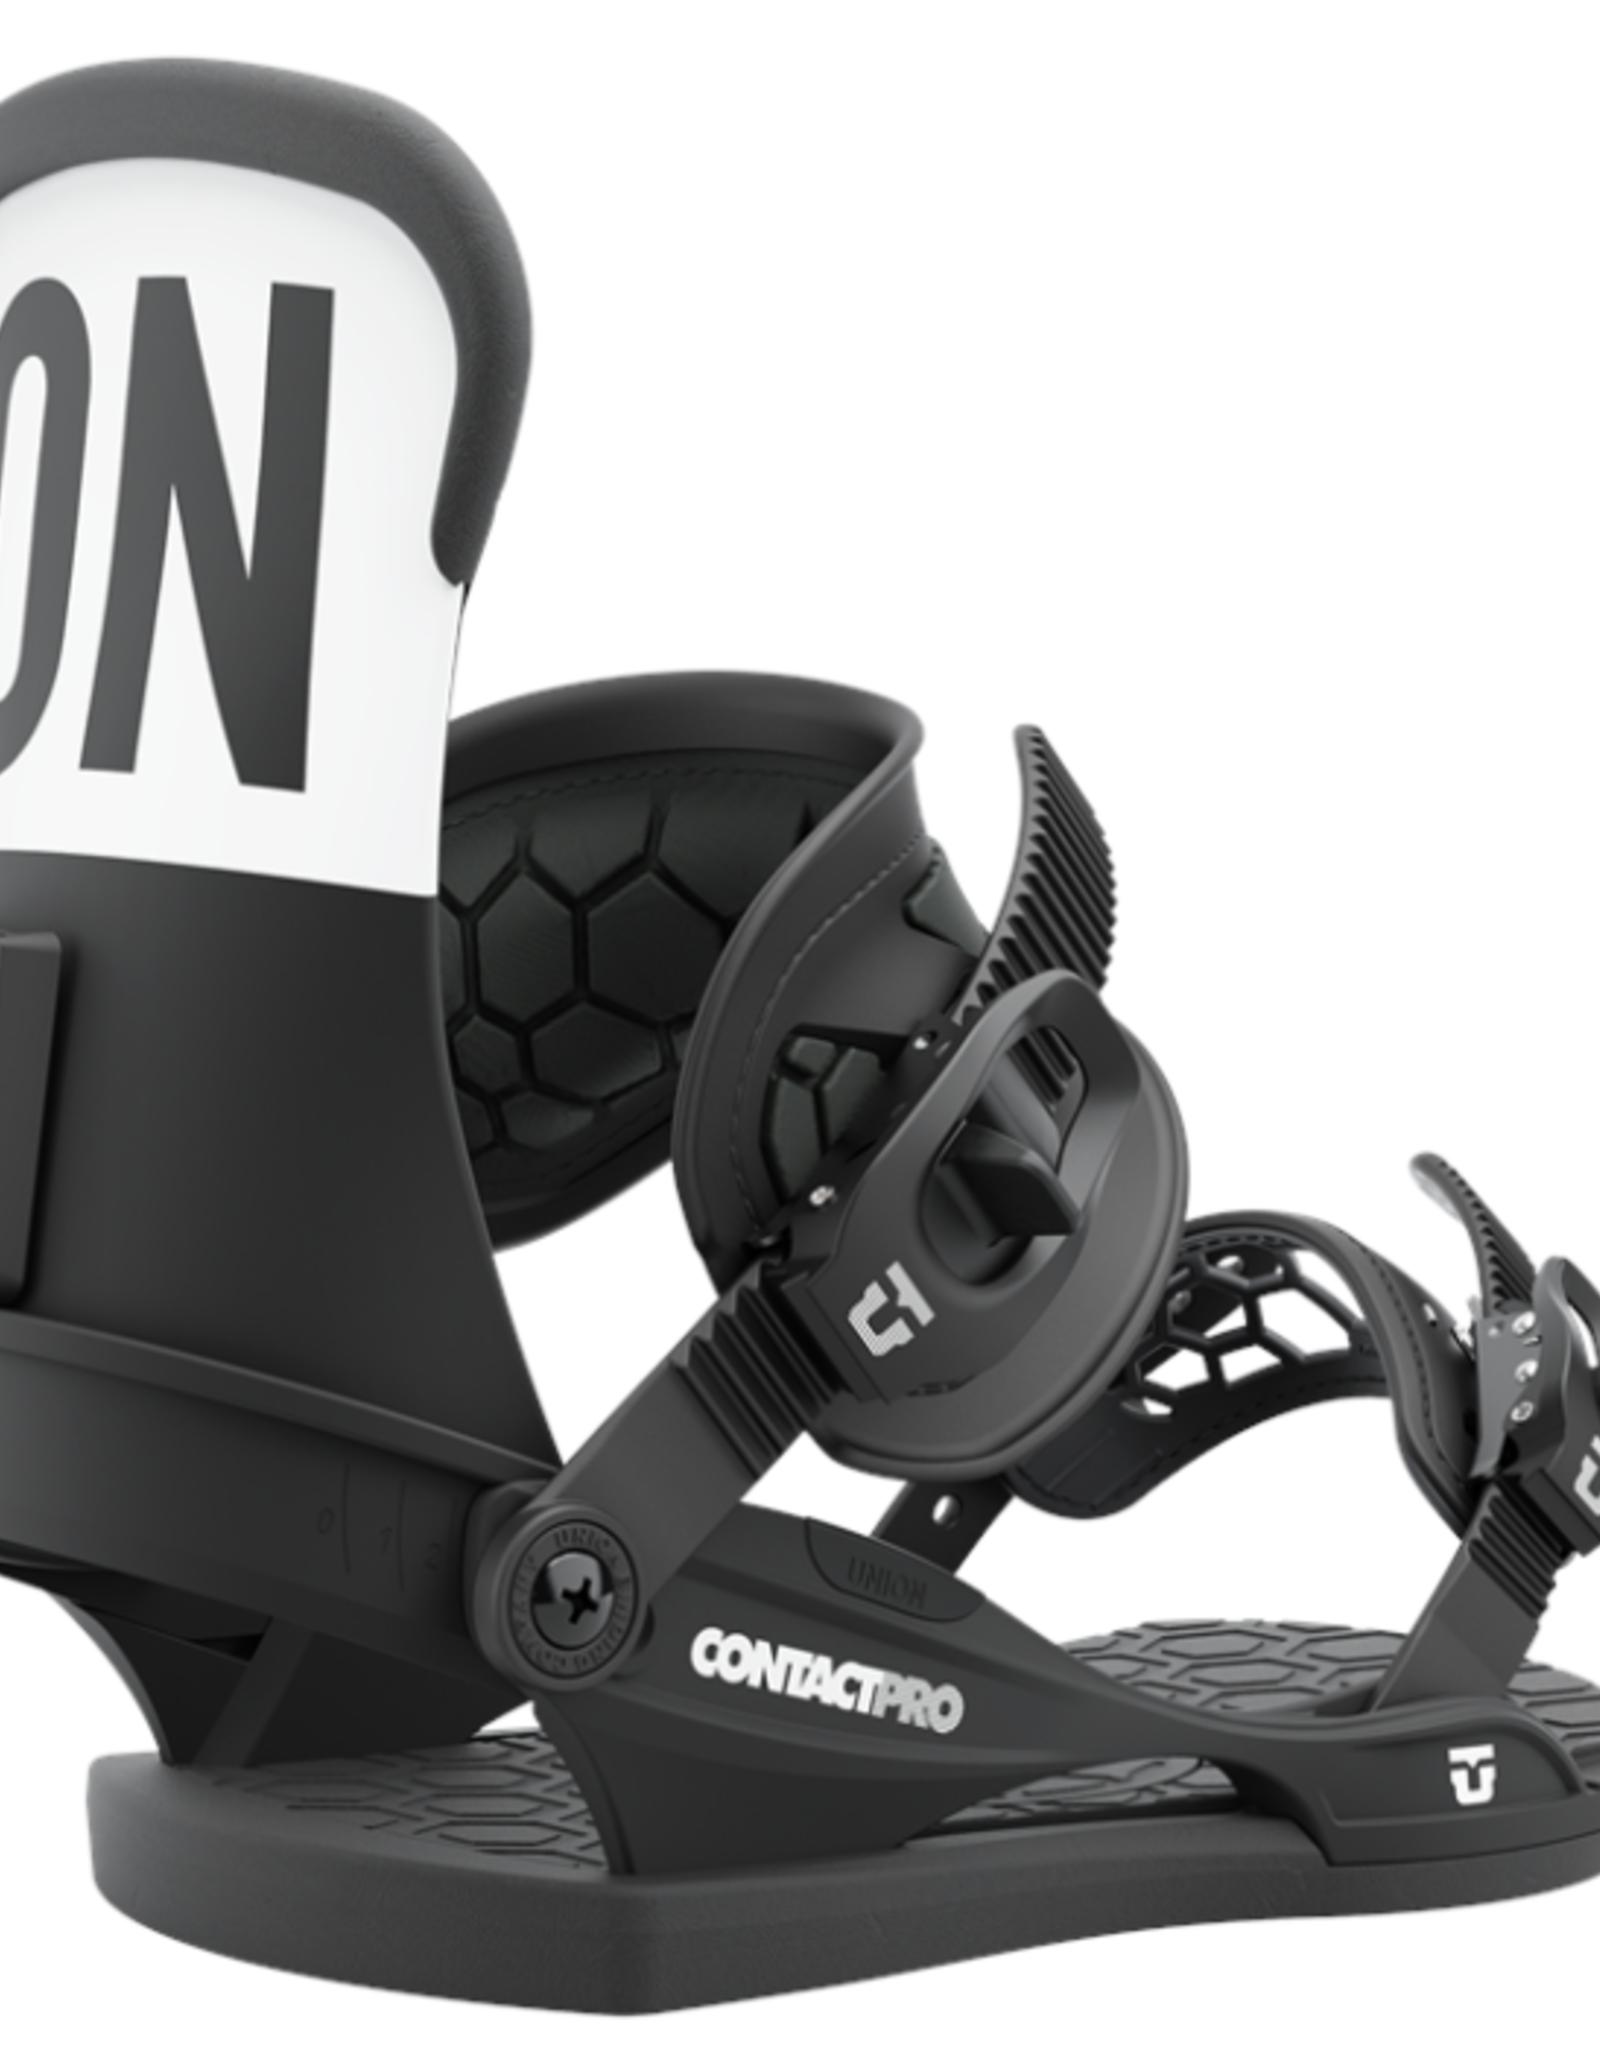 UNION Union Men's Contact Pro Bindings Black 2022